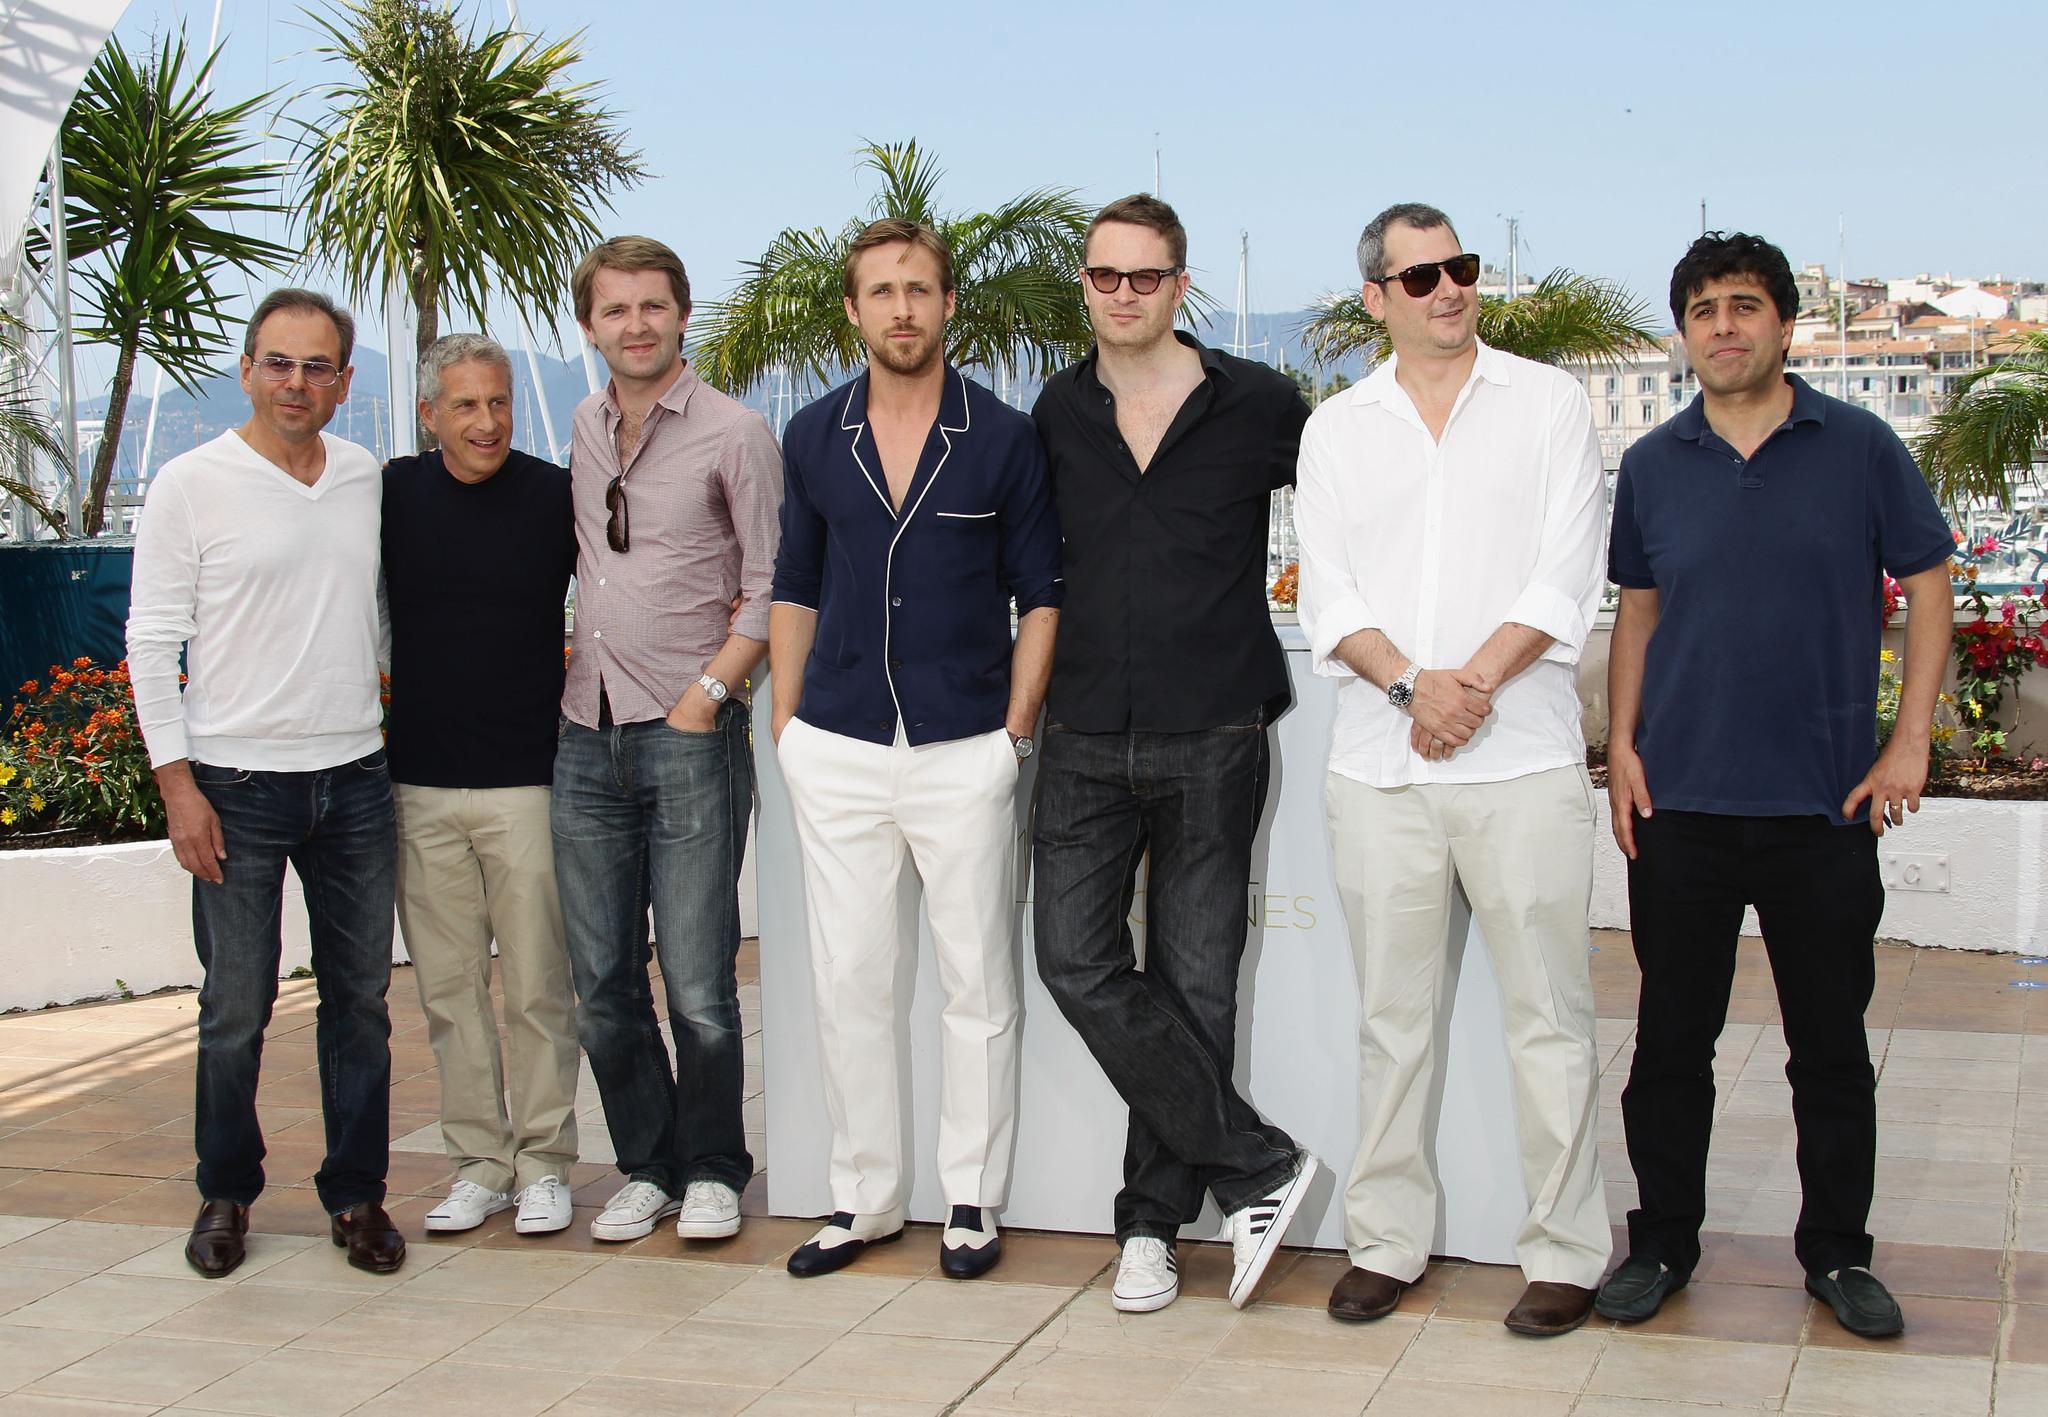 Hossein Amini, Ryan Gosling, Marc Platt, Nicolas Winding Refn, Adam Sigel, Michel Litvak, and Matthew Newman at an event for Drive (2011)